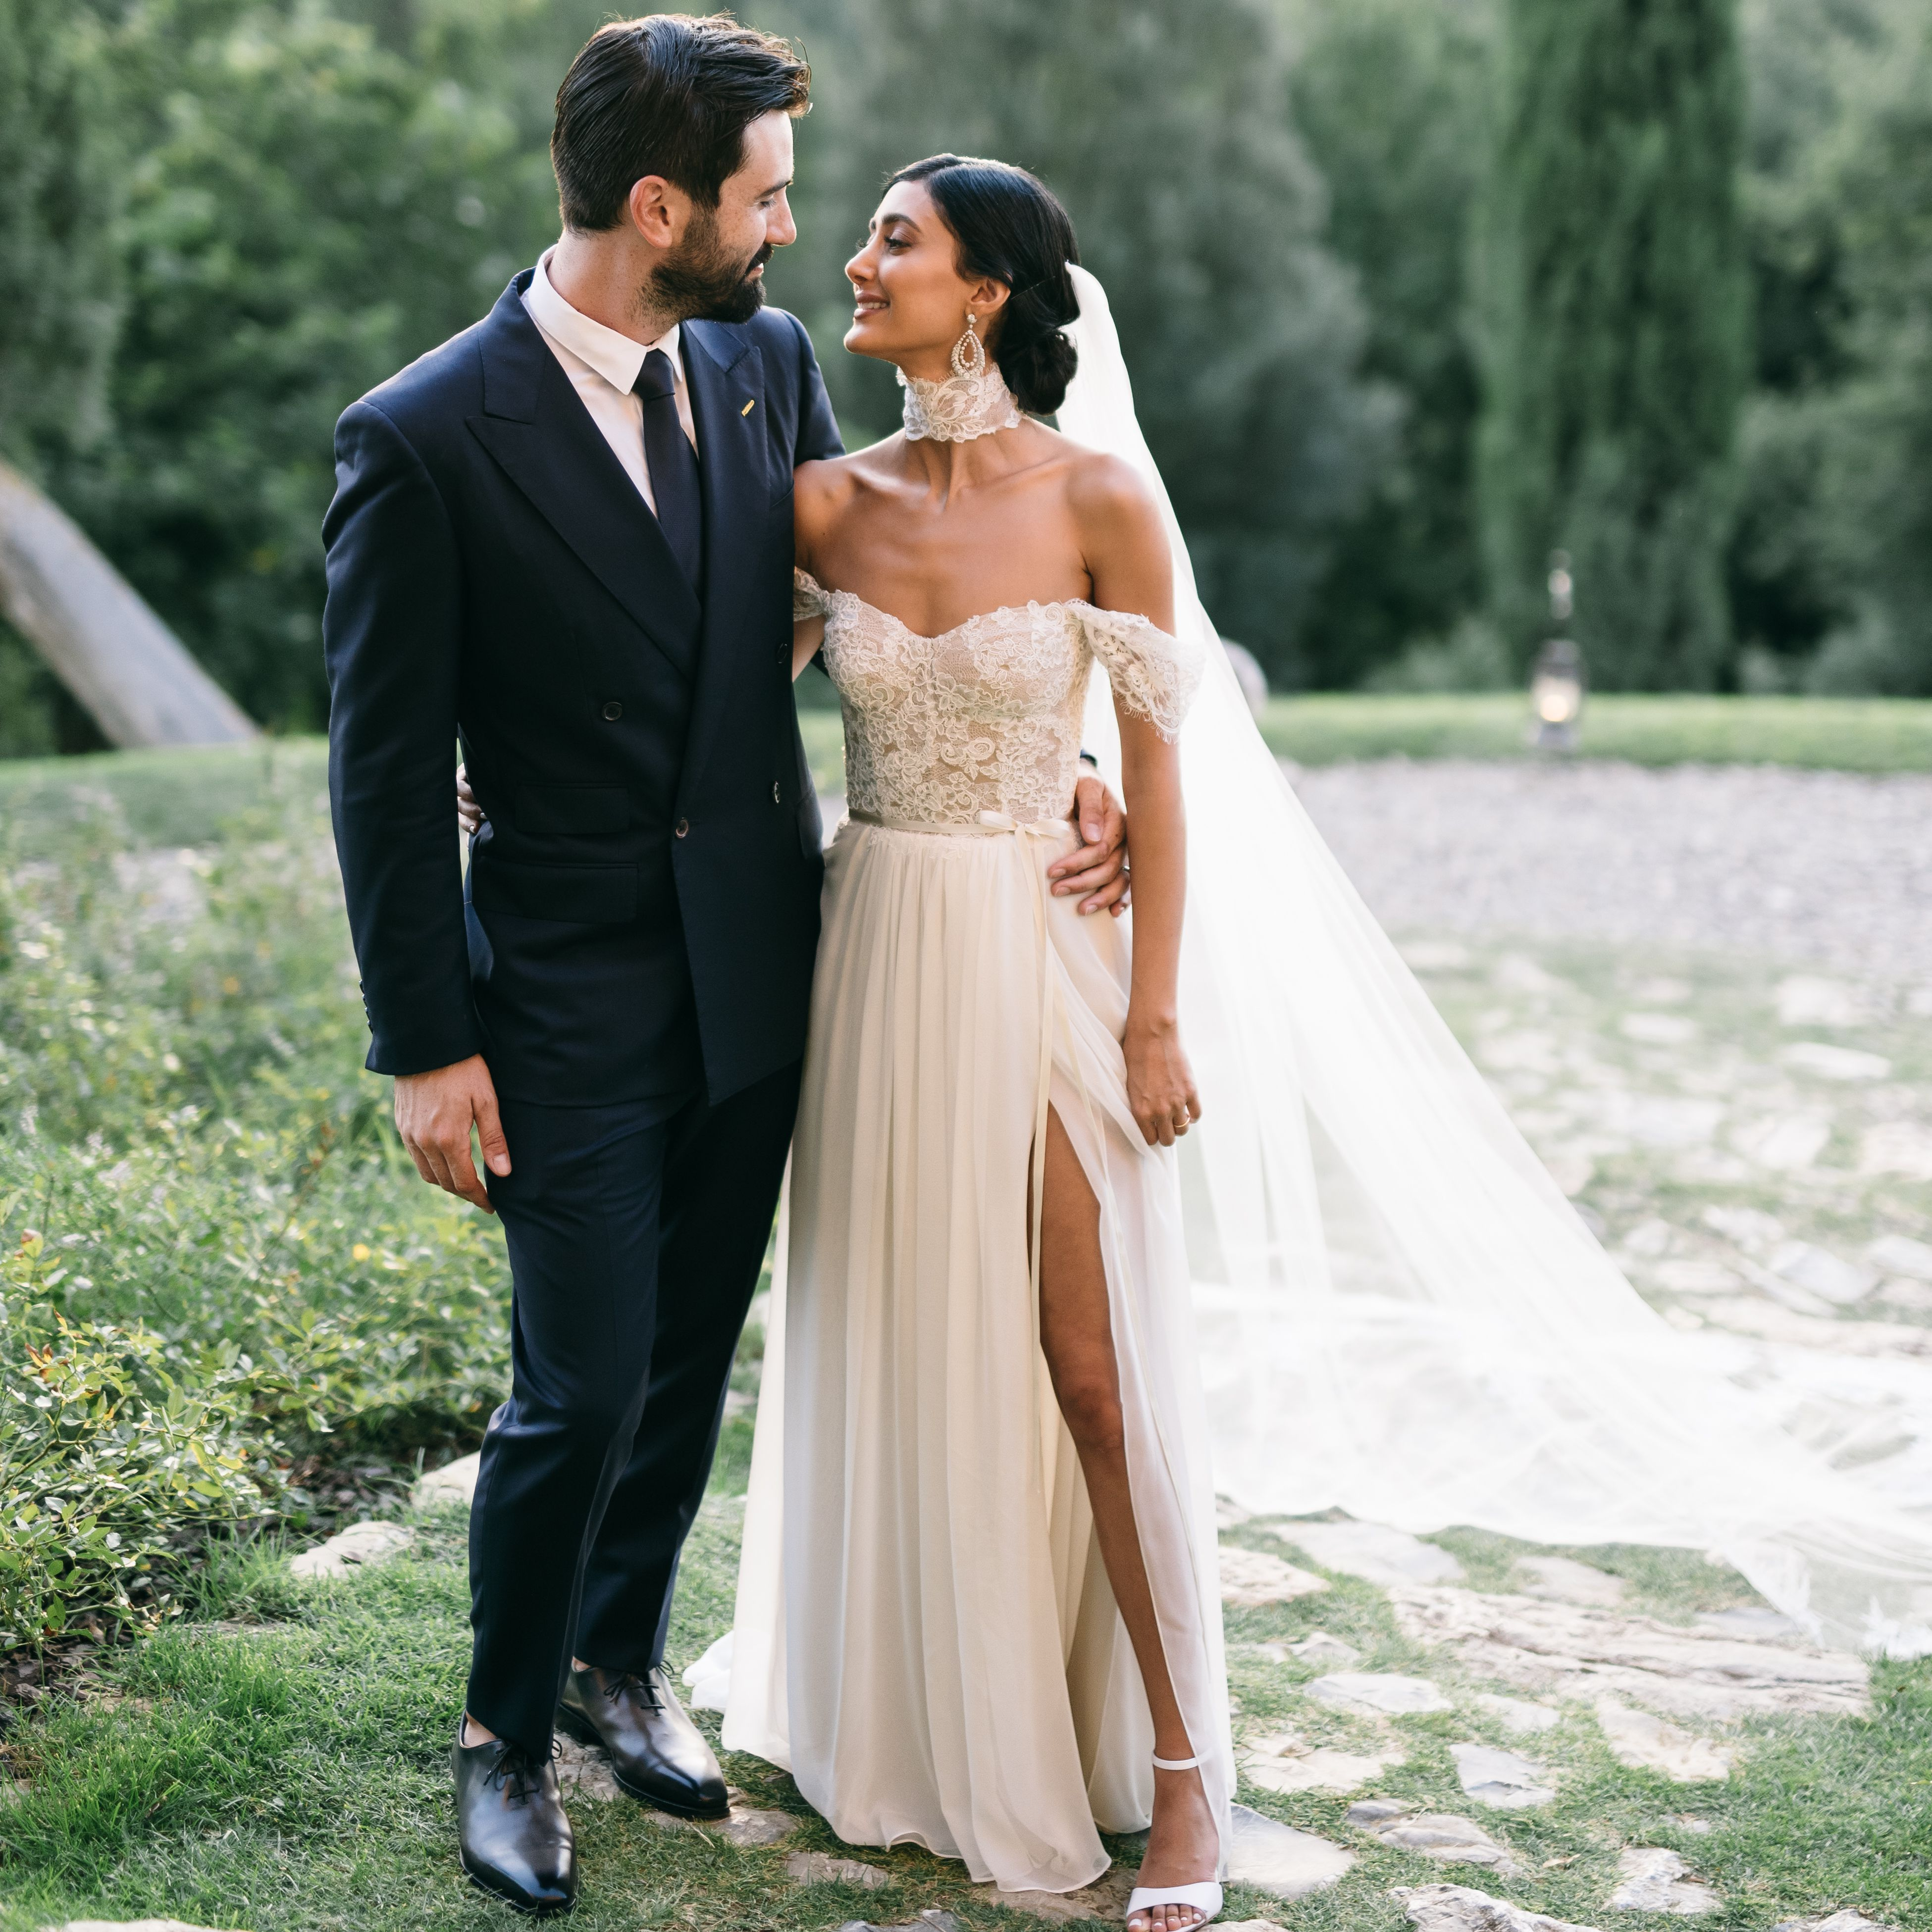 8 Corset Wedding Dresses We Love